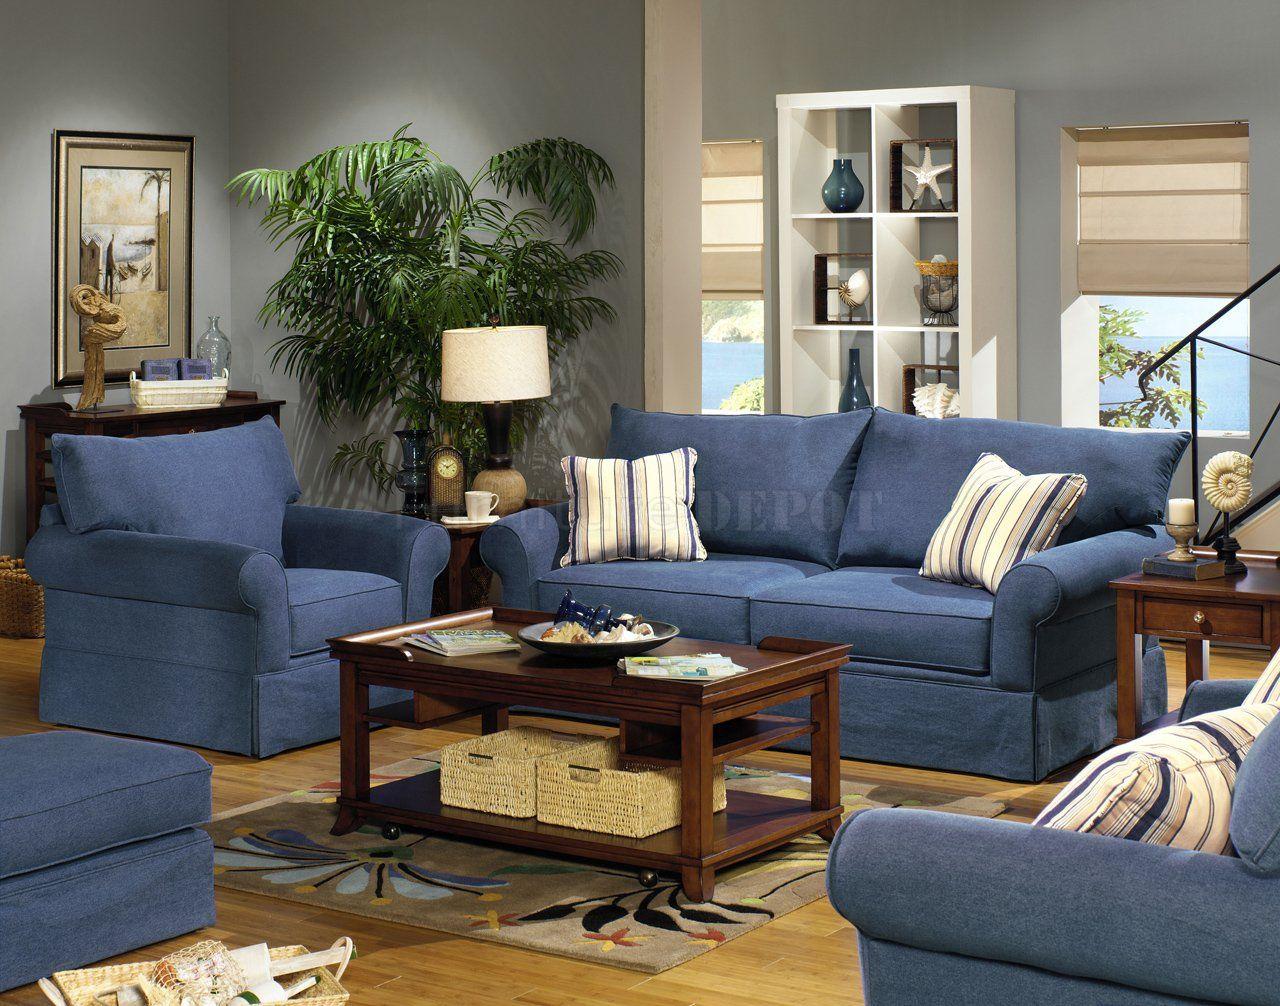 blue jean stain on sofa black vinyl futon living room furniture sets denim fabric modern